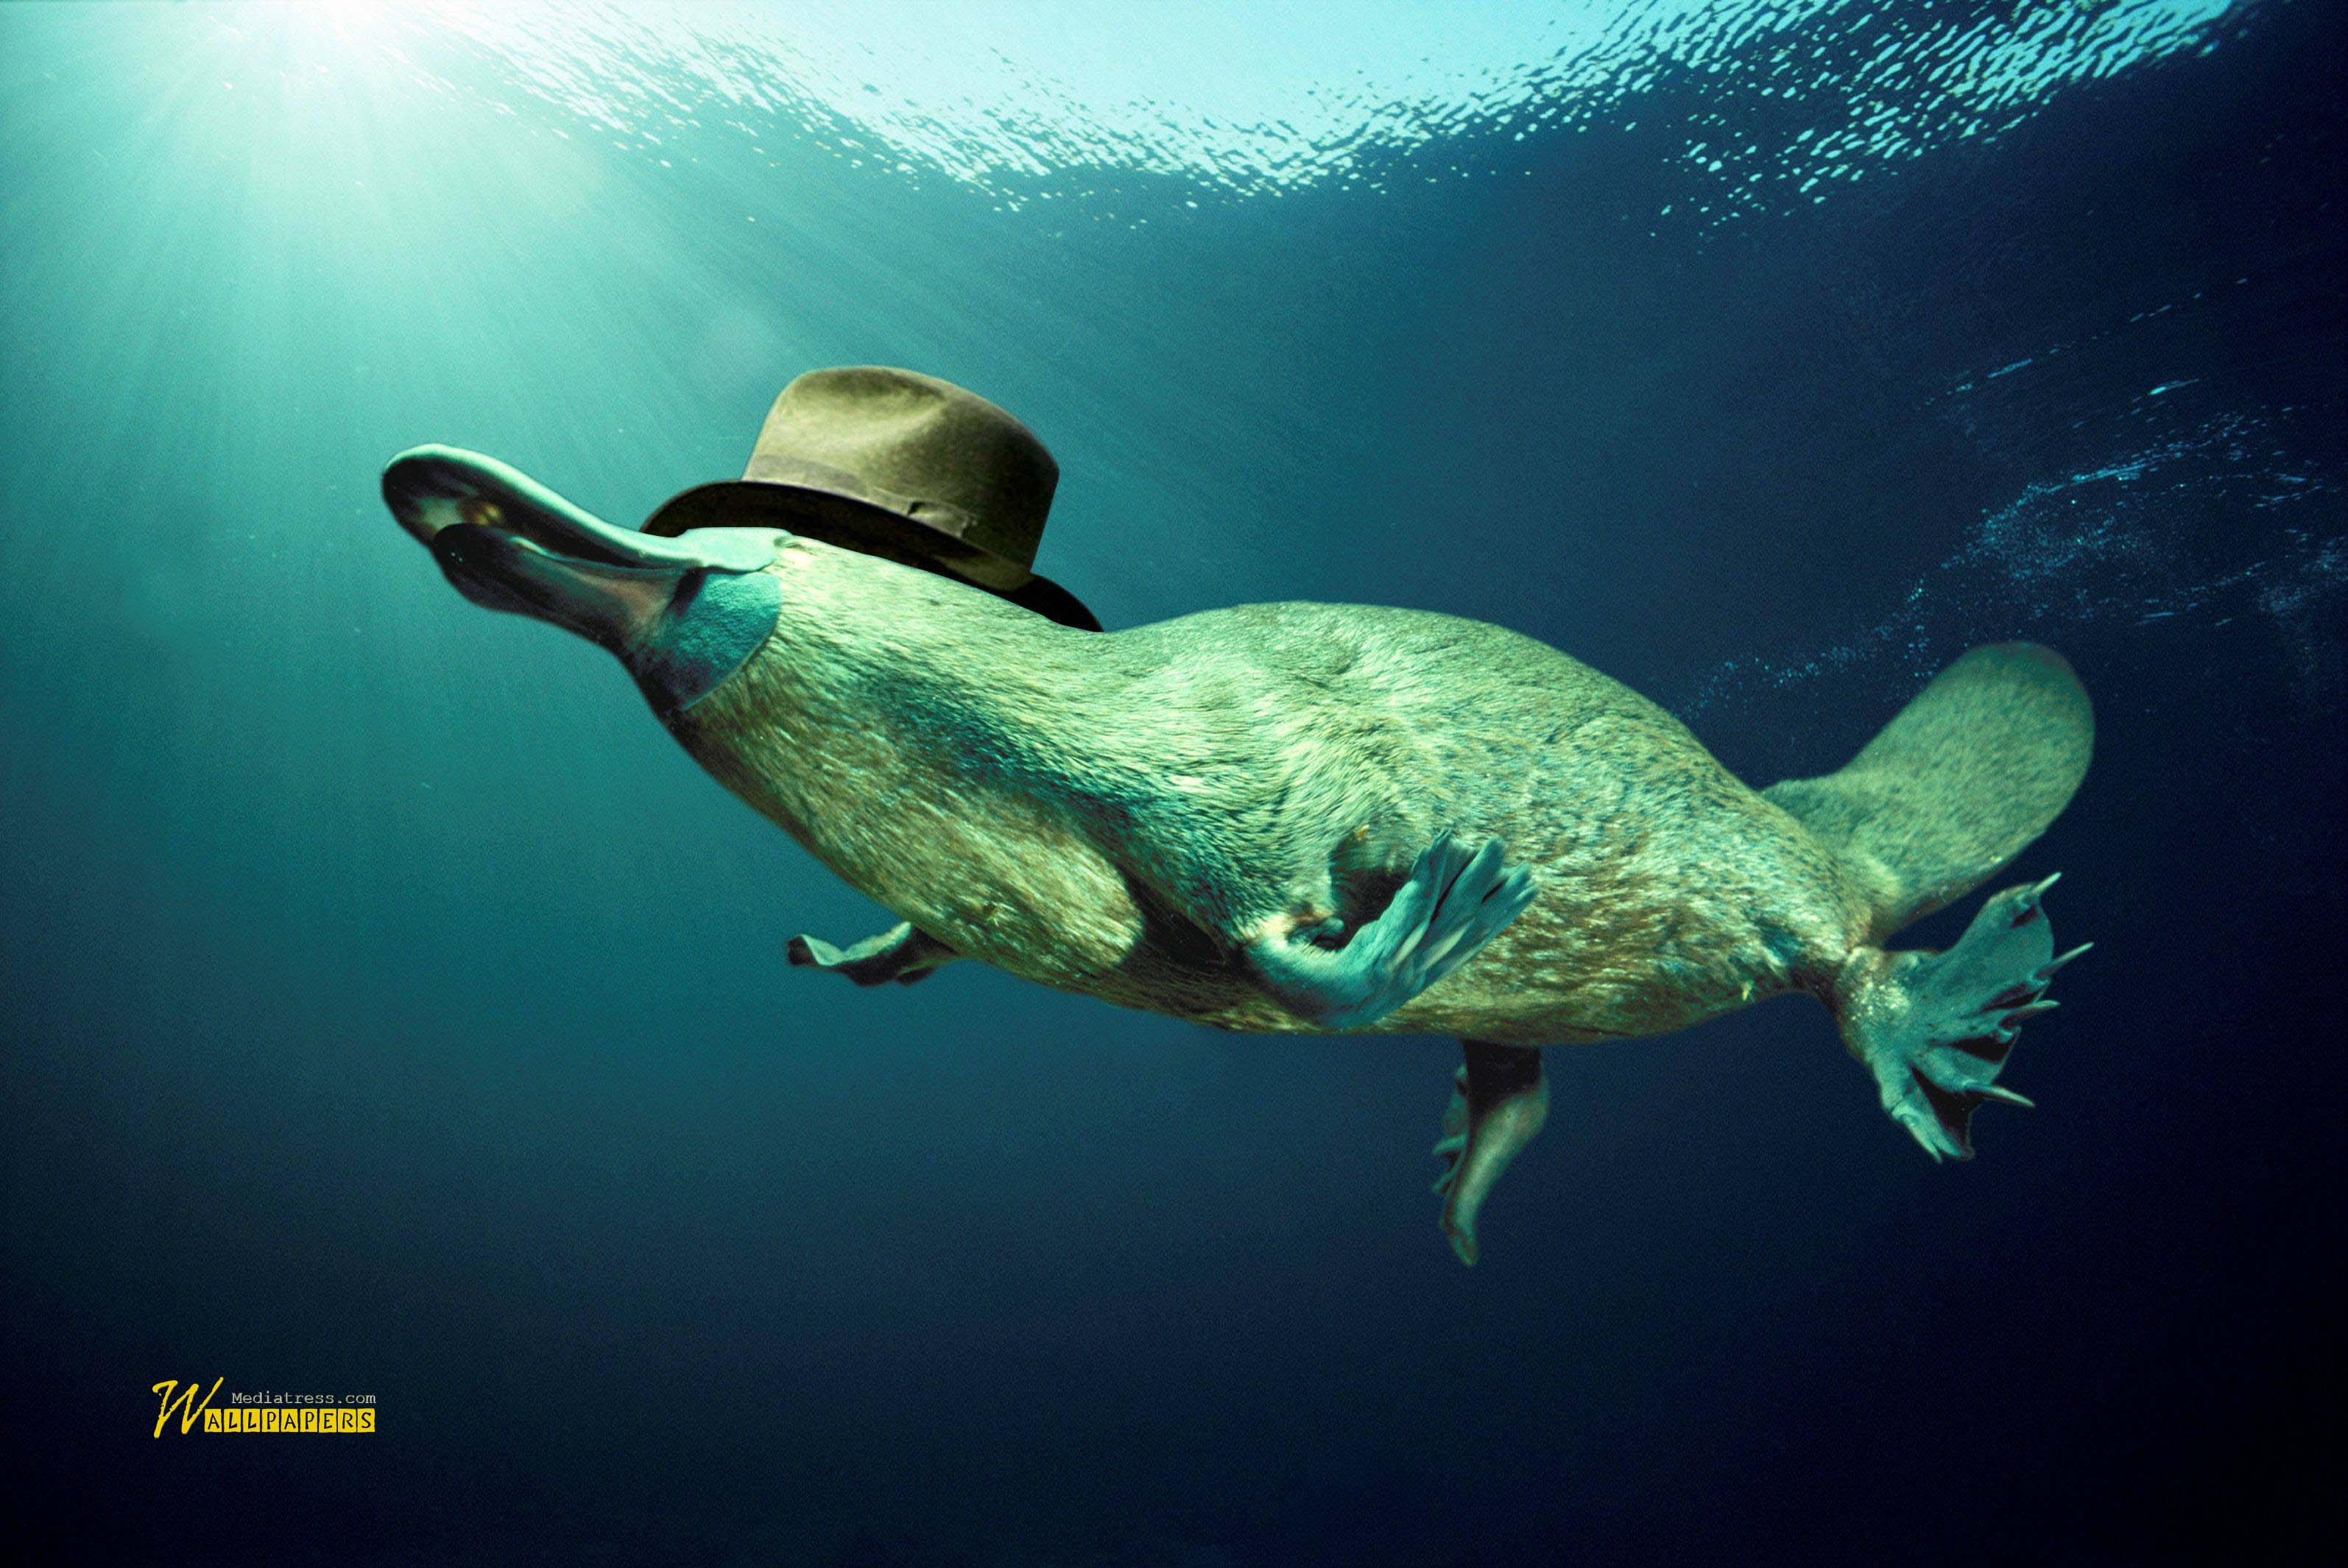 funny-sea-creature-underwater-full-hd-walpaper